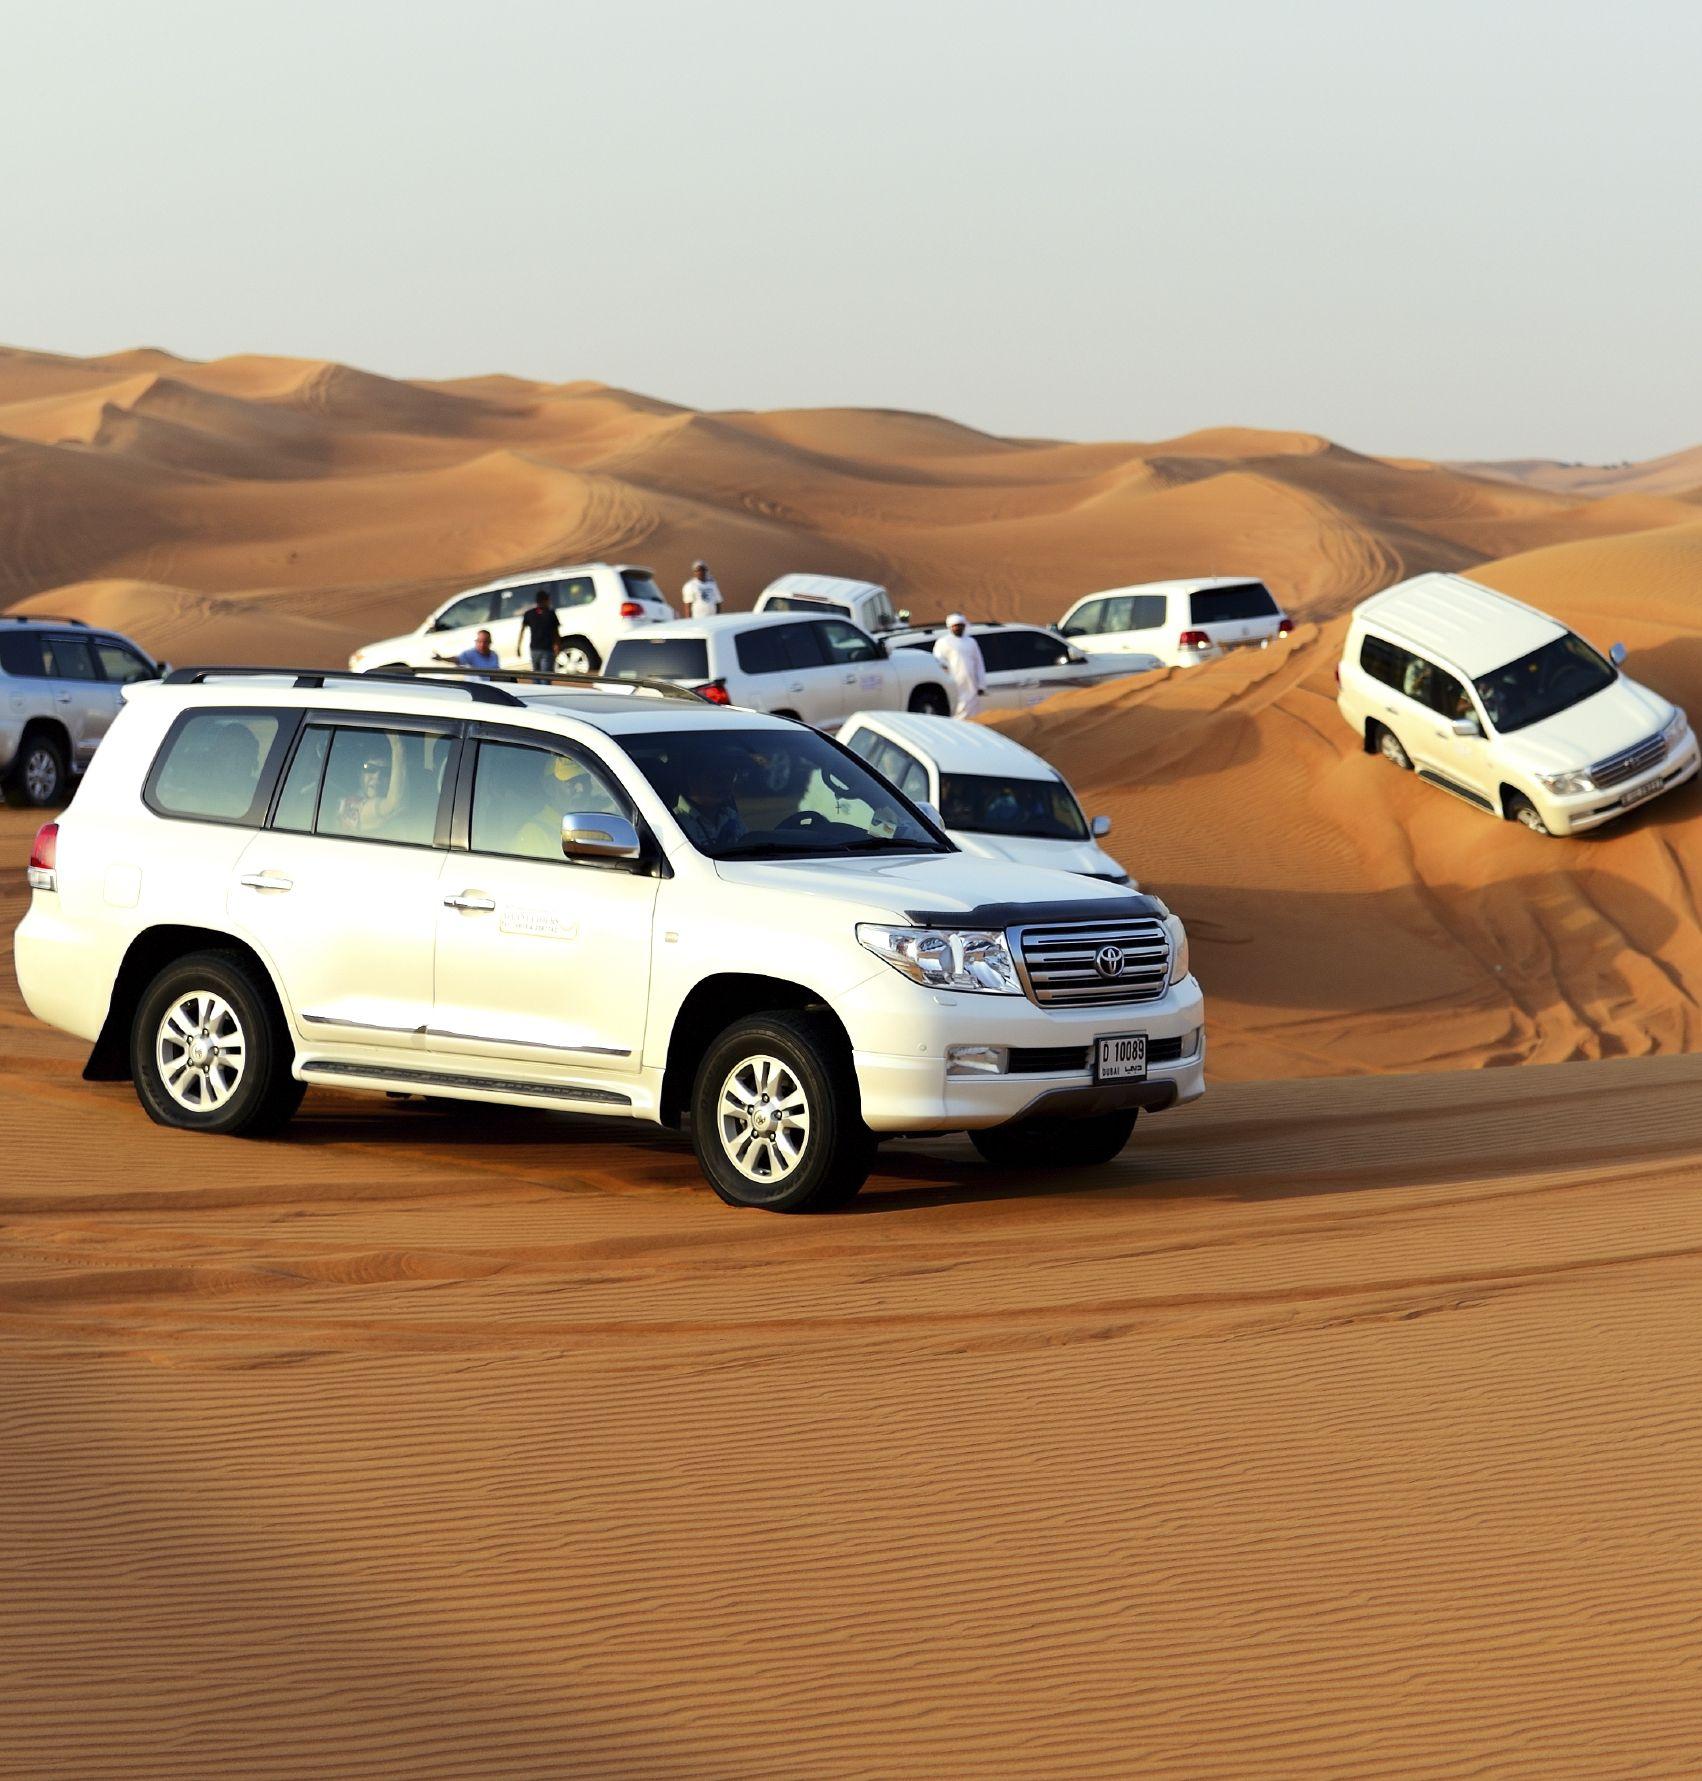 DUBAI, UAE - SEPTEMBER 12: The Dubai desert trip in off-road car